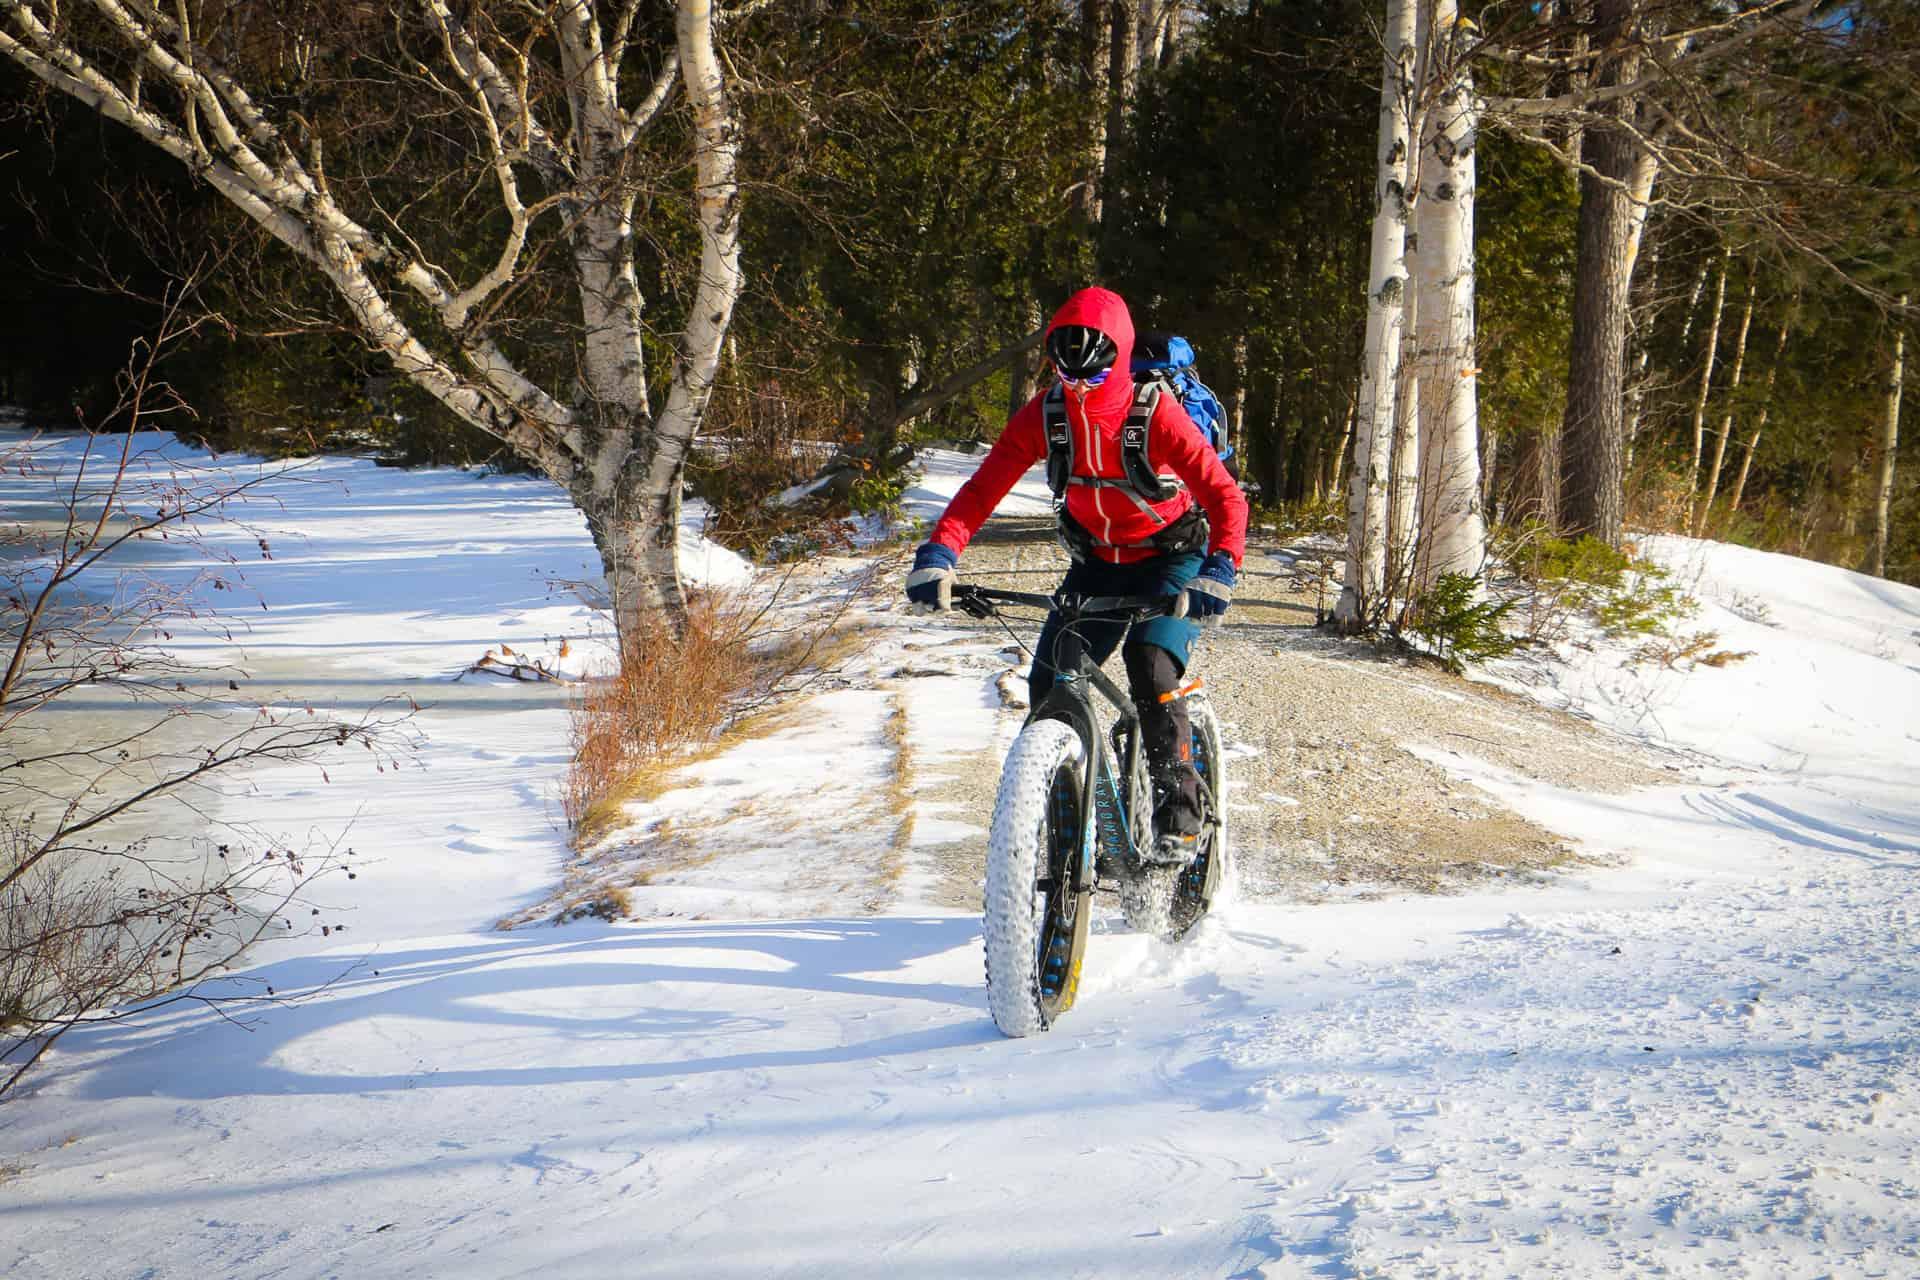 A lady climbing a snowy road on a fat bike